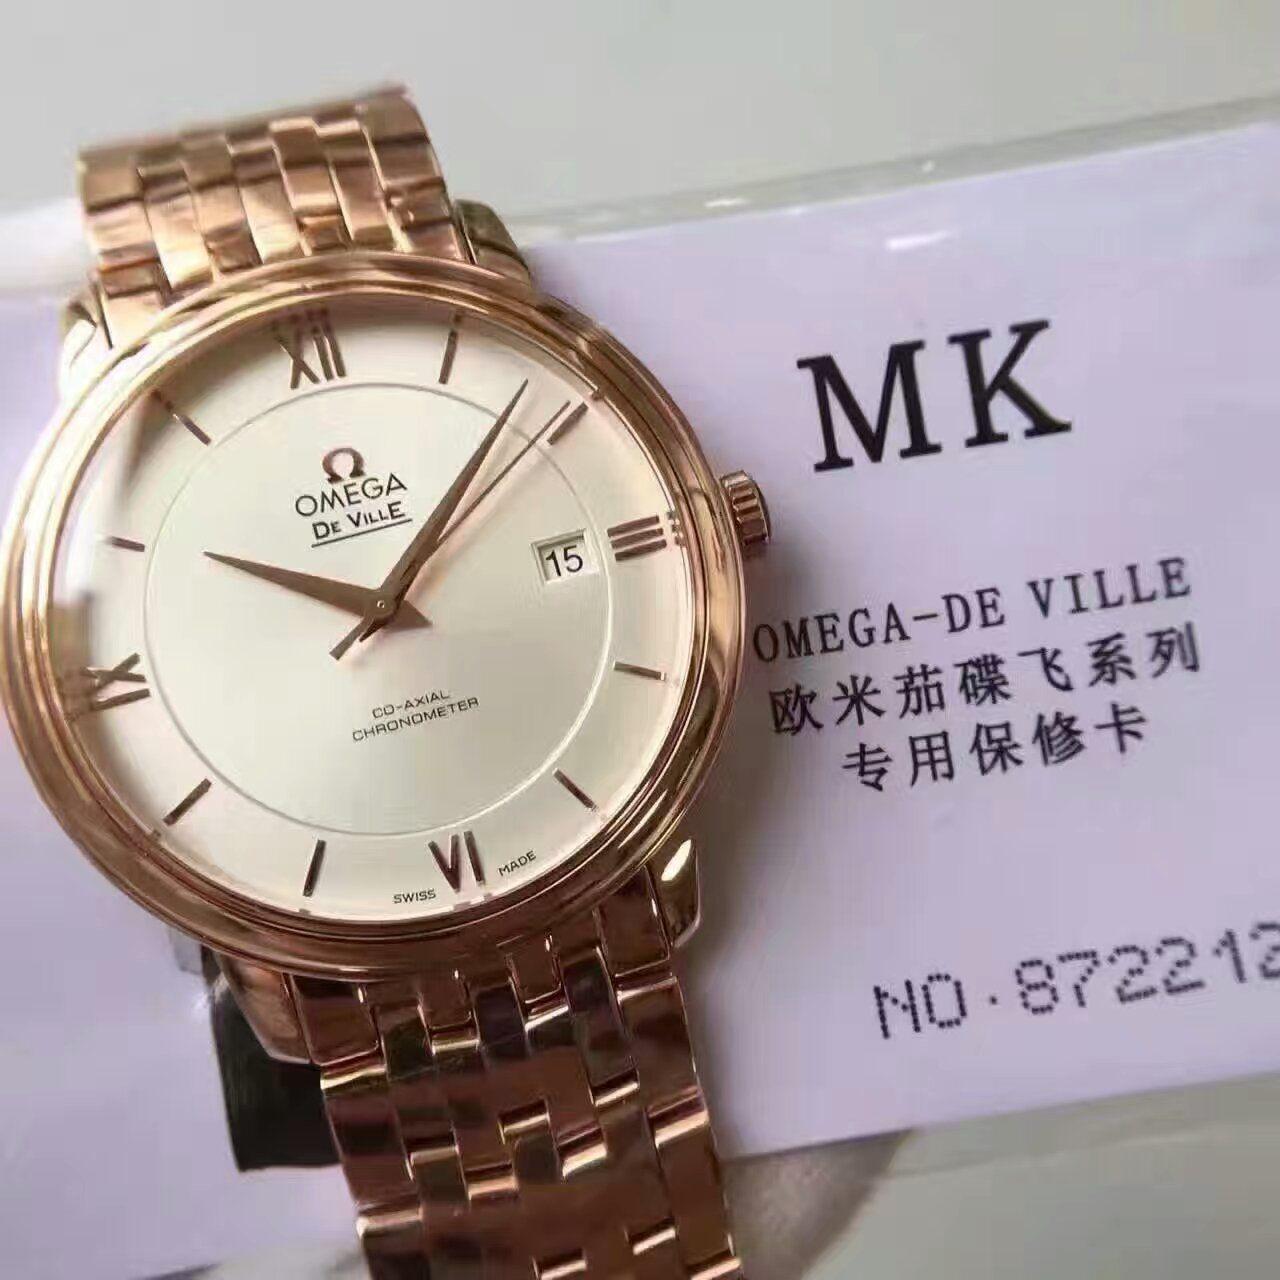 【MK厂1:1精仿手表】欧米茄碟飞系列424.53.40.20.02.002腕表 / M191